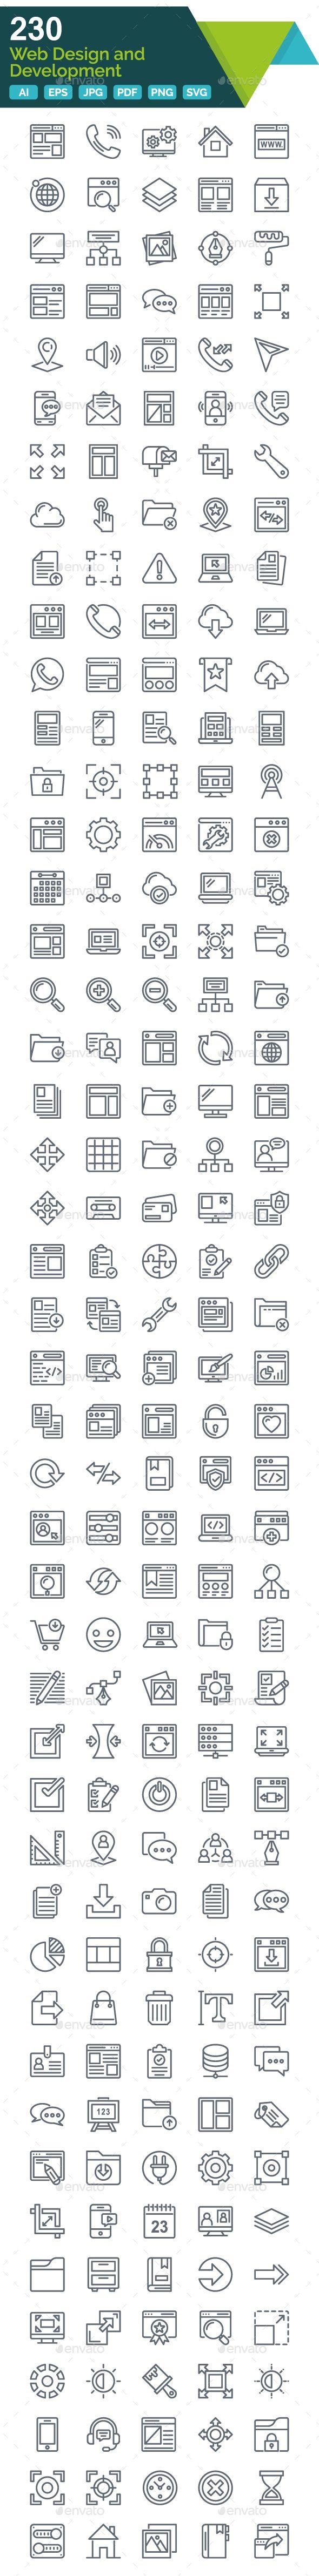 Web Design and Development Line icons